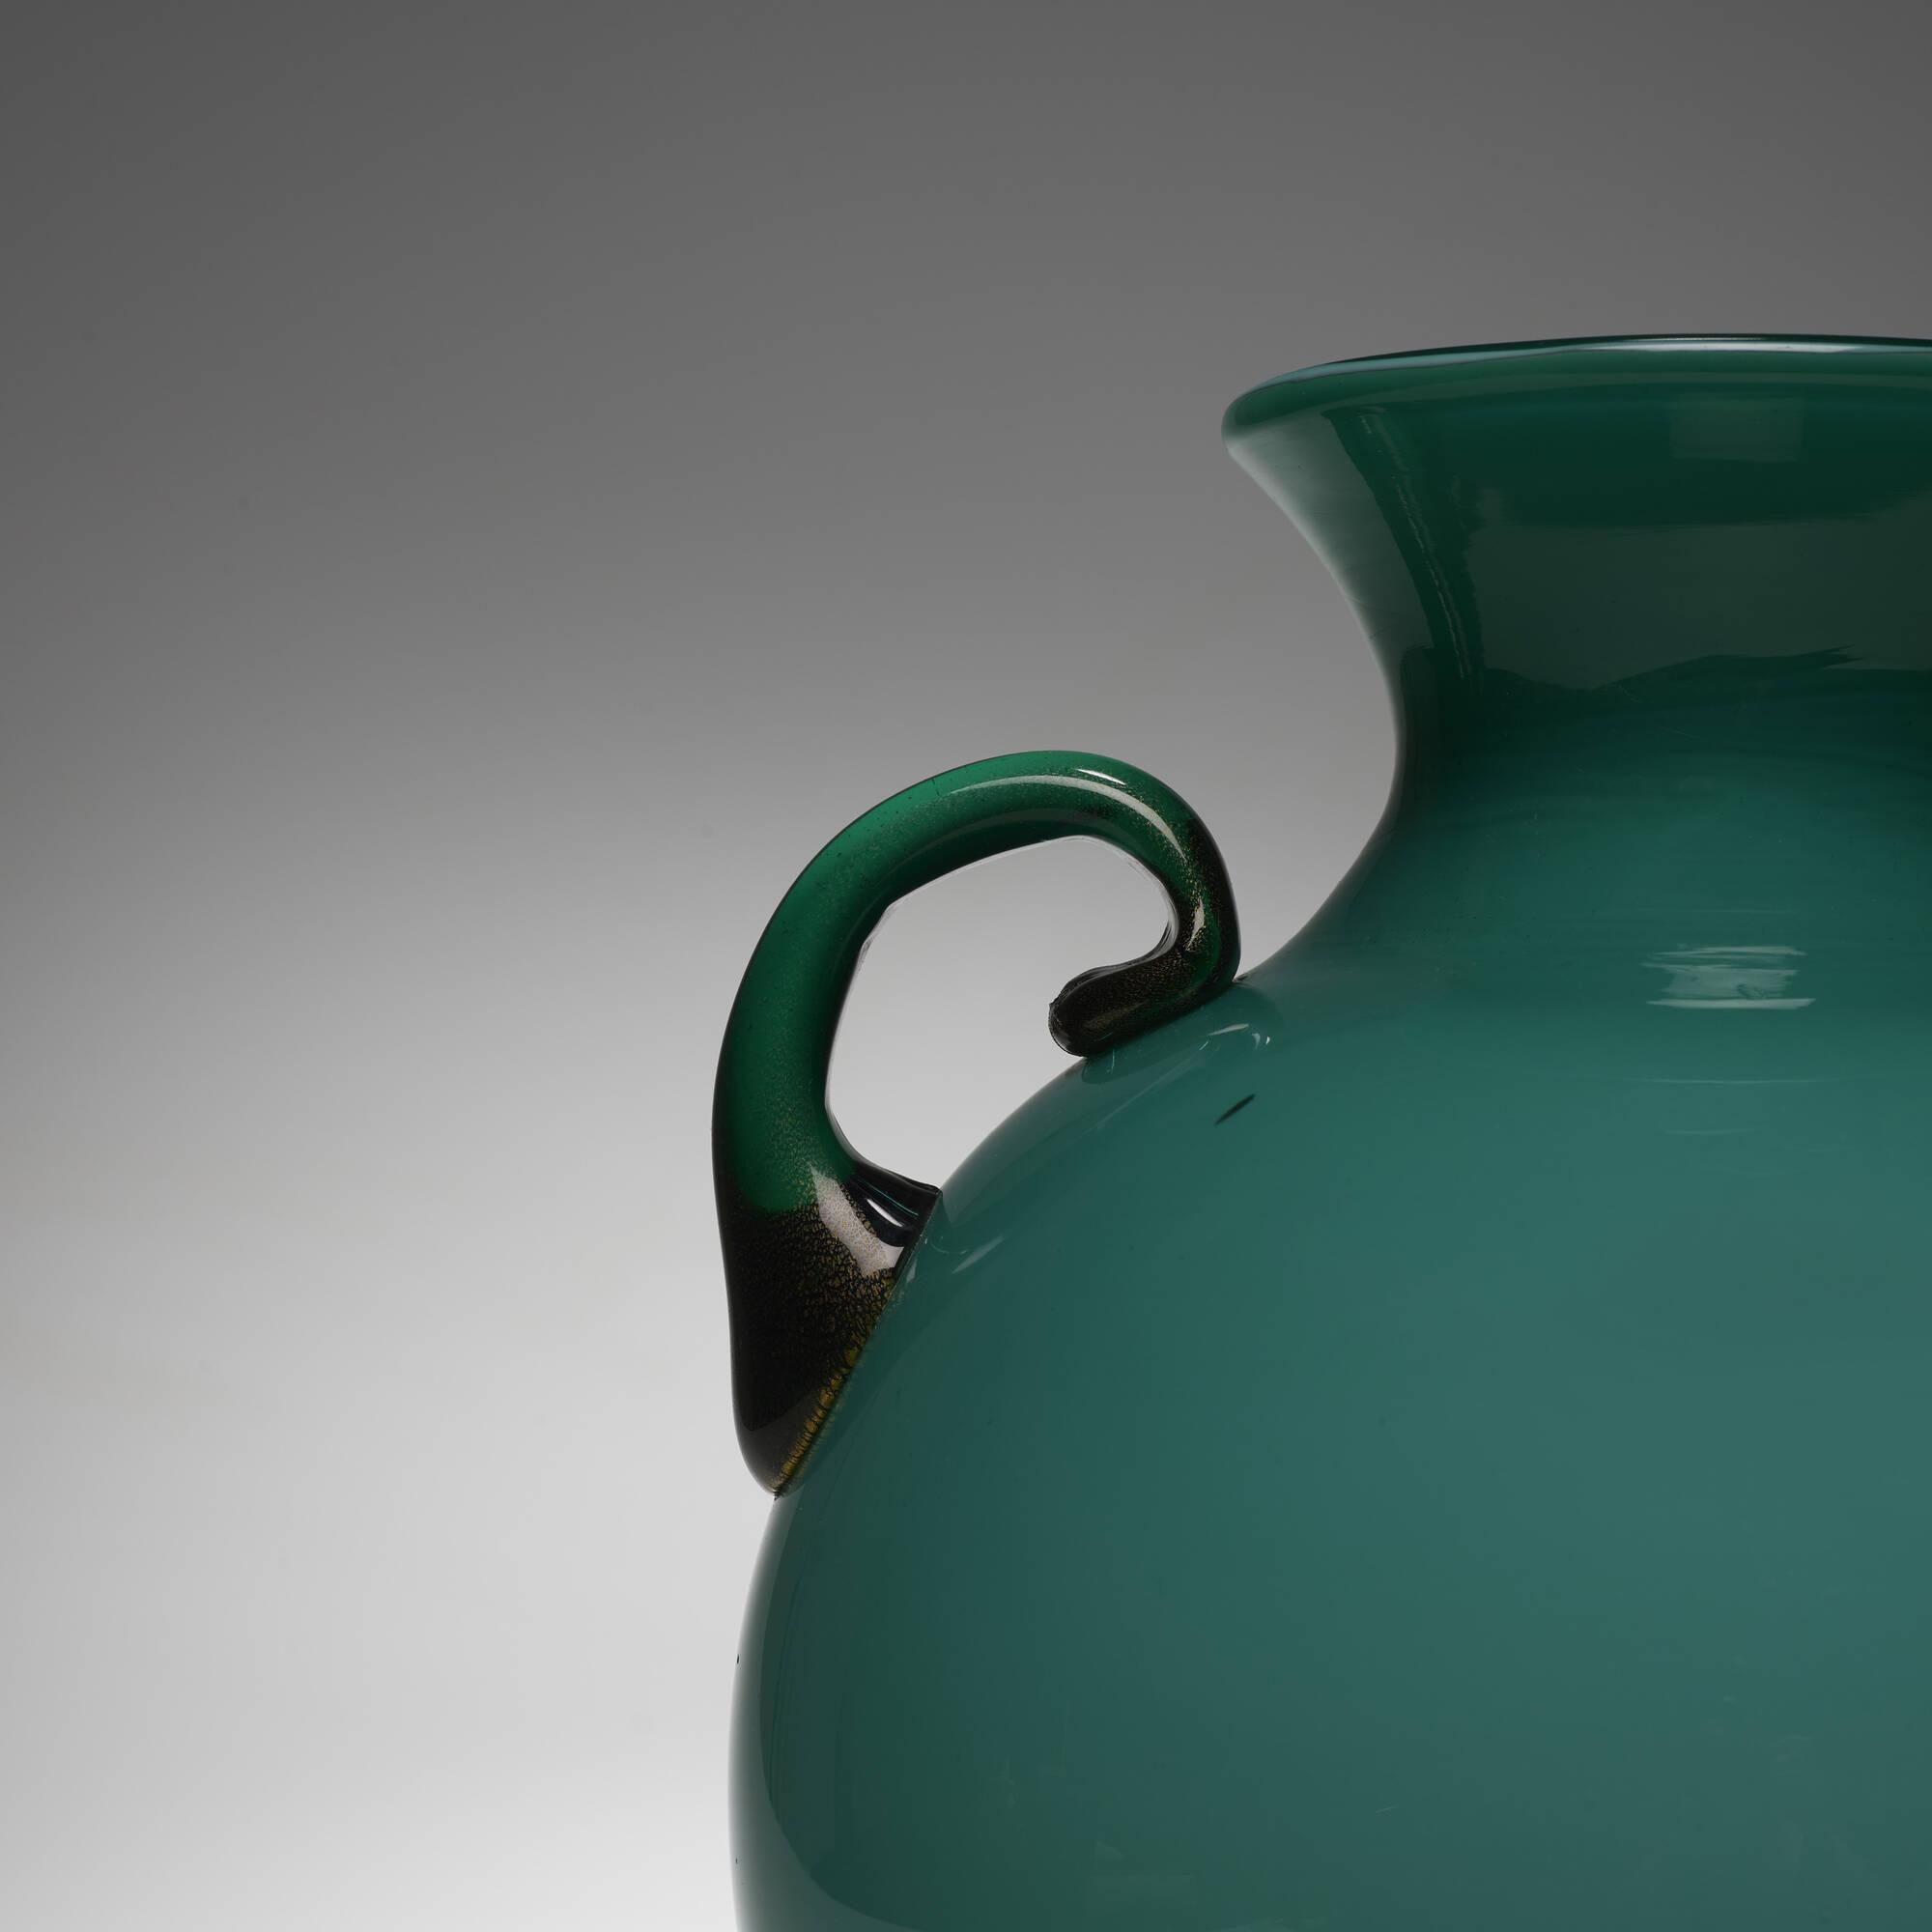 112: Flavio Poli / Incamiciato vase, model 3577/4695 (2 of 2)